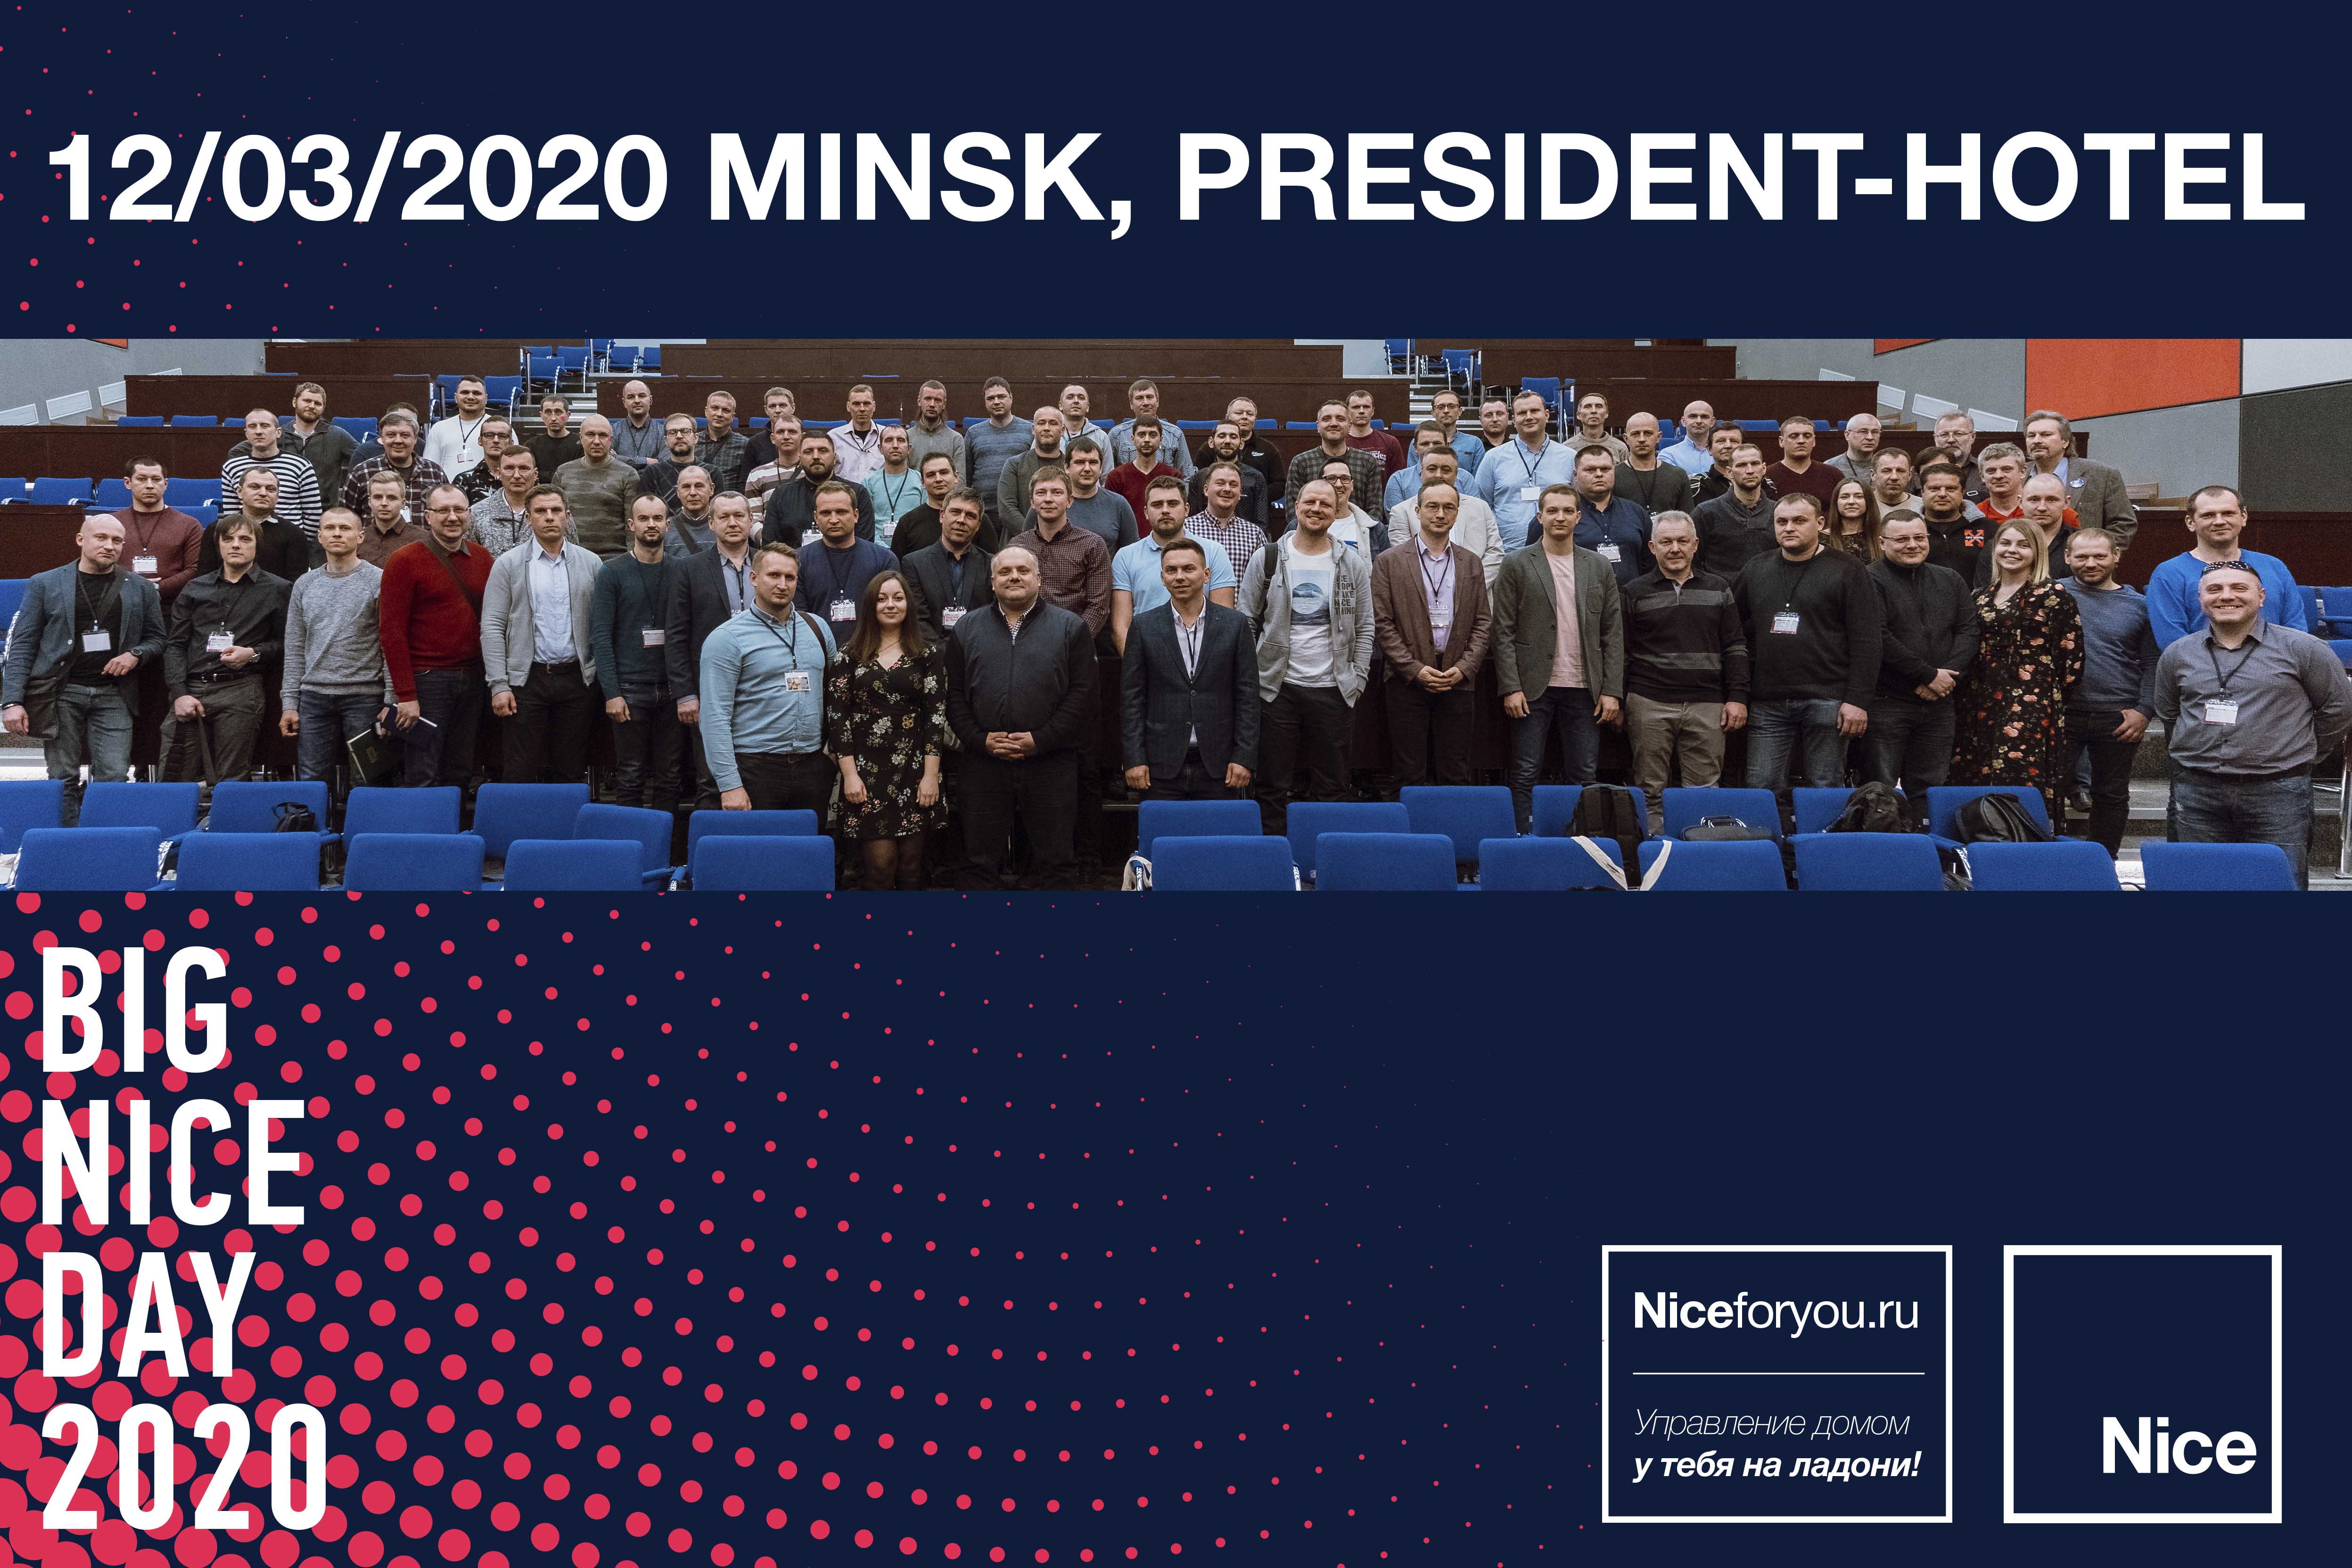 Big Nice Day Minsk 12/03/2020